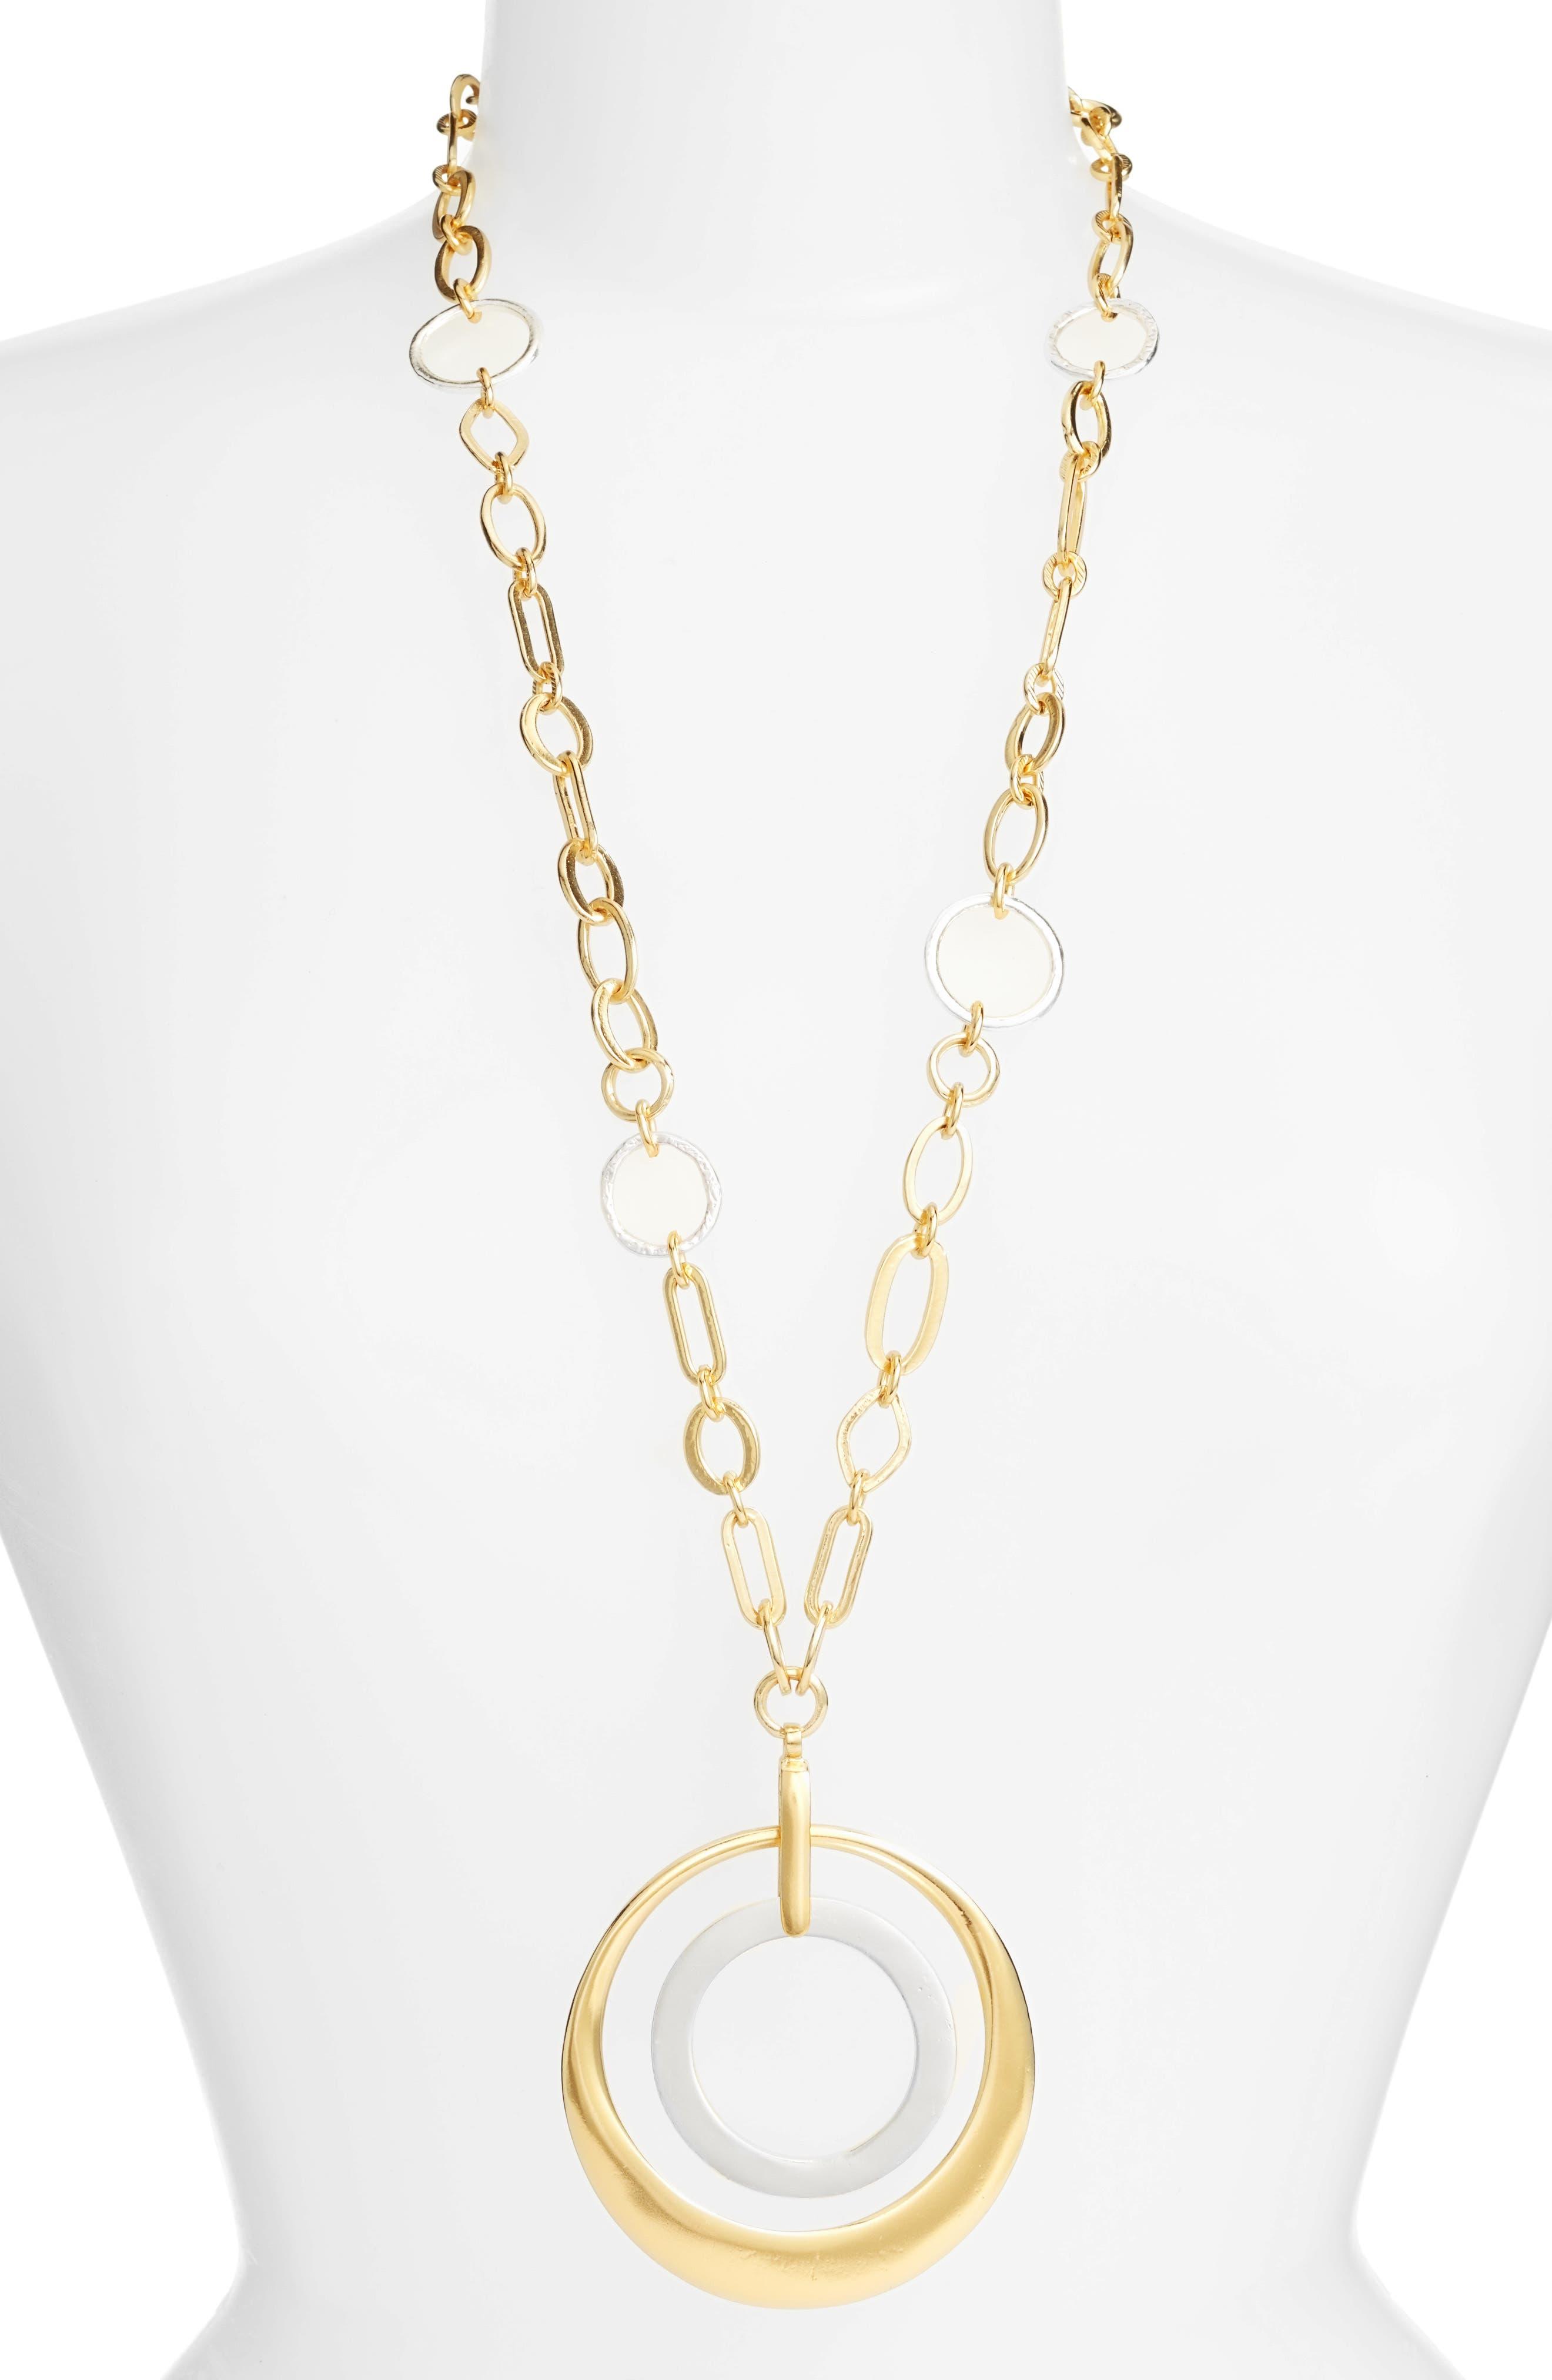 Double Circle Pendant Necklace,                             Main thumbnail 1, color,                             GOLD